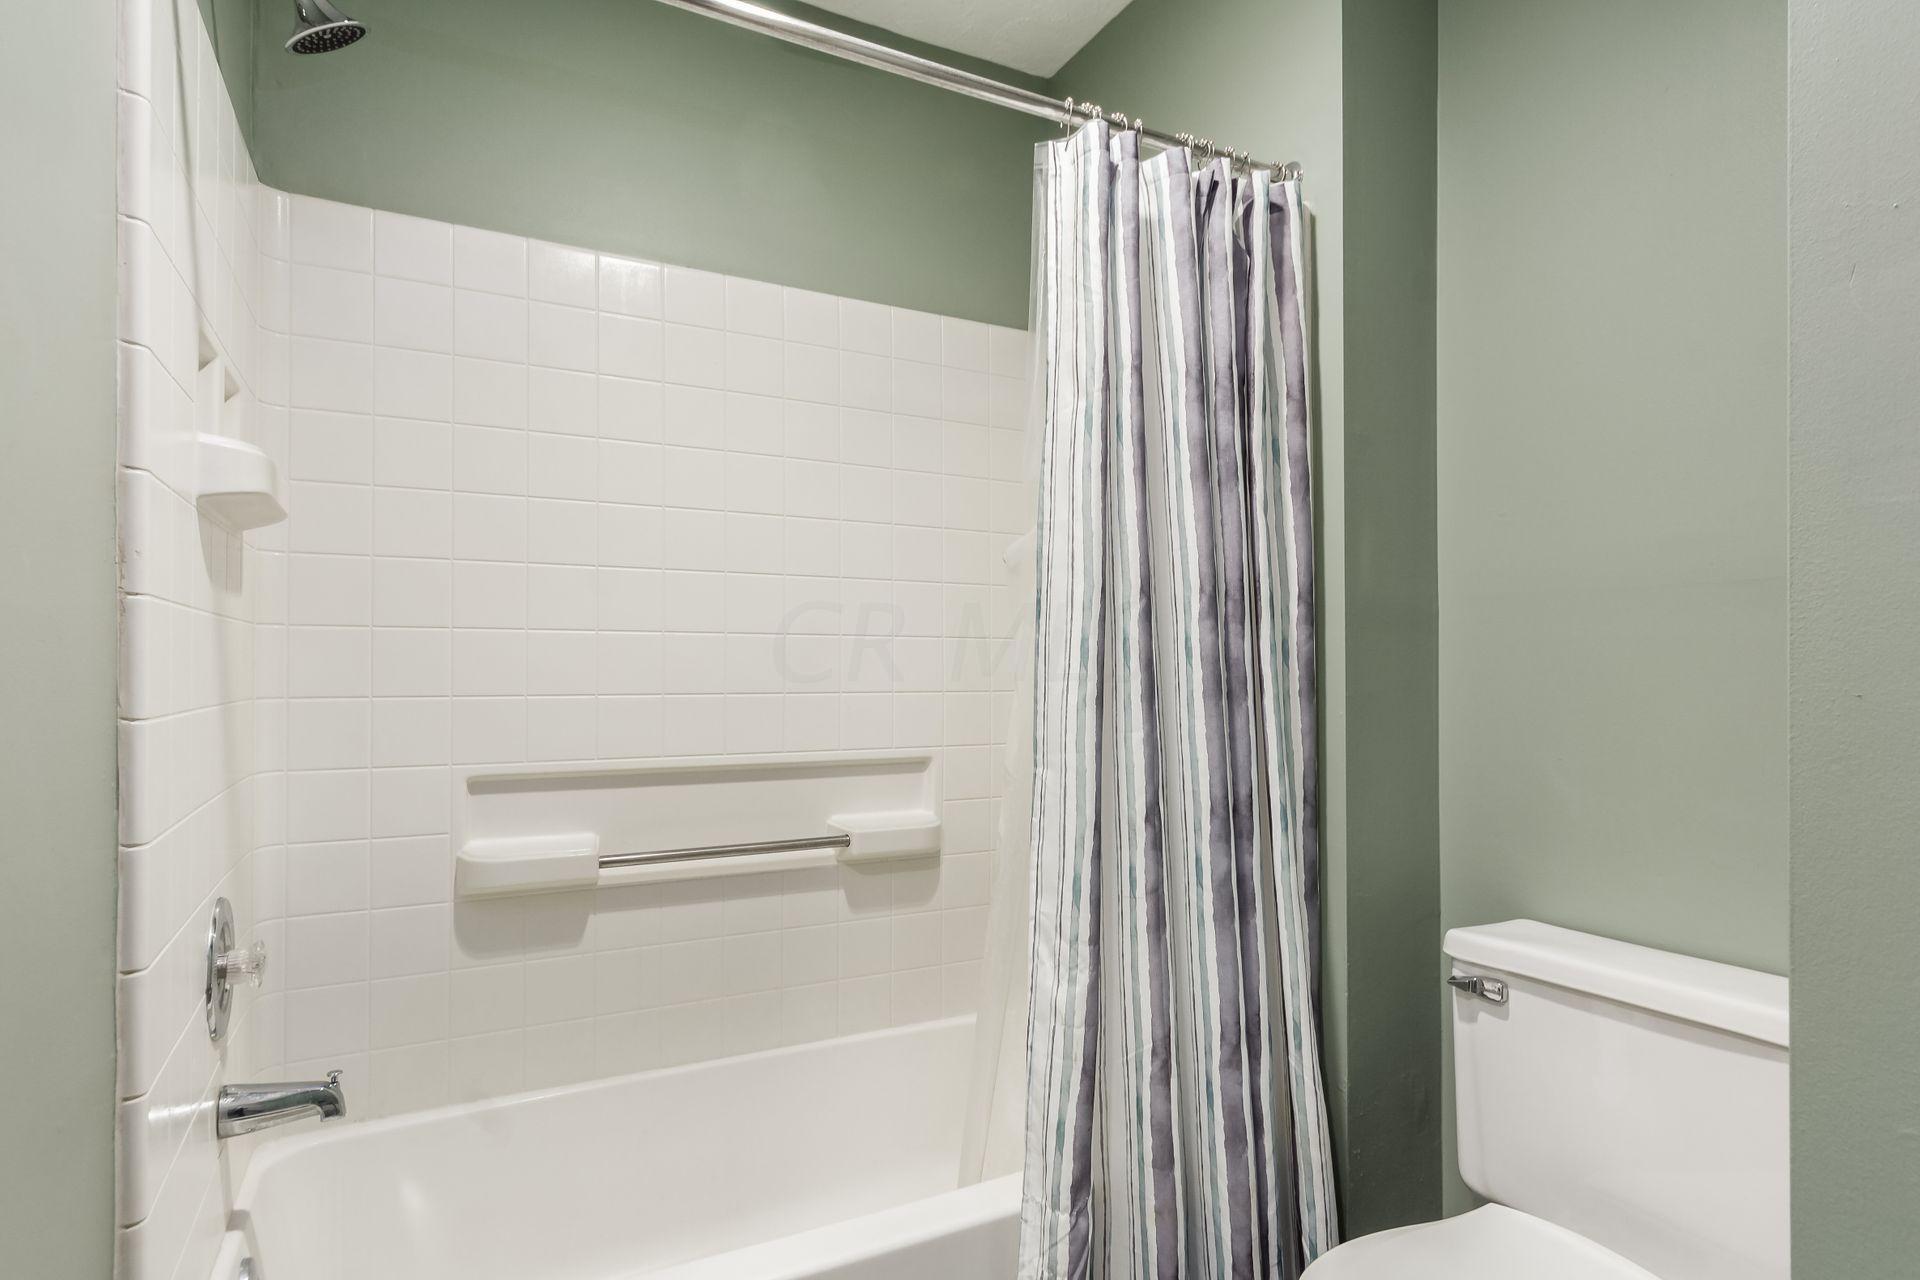 3605 Hilliard Station Road, Hilliard, Ohio 43026, 2 Bedrooms Bedrooms, ,2 BathroomsBathrooms,Residential,For Sale,Hilliard Station,220040899